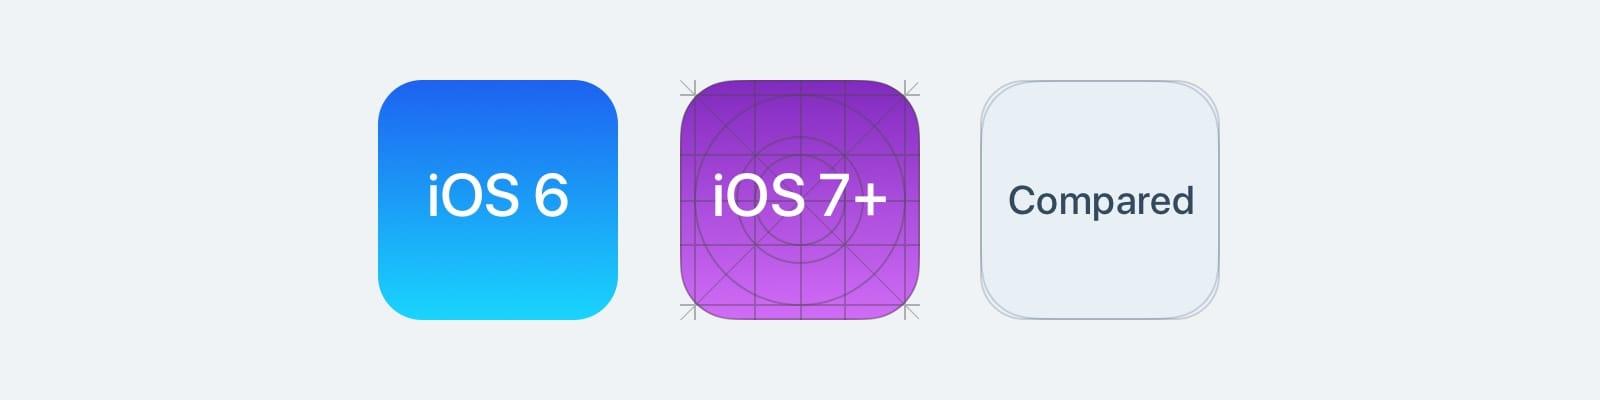 Дизайн под iPhone X. Гайдлайны для iOS 11 - 14